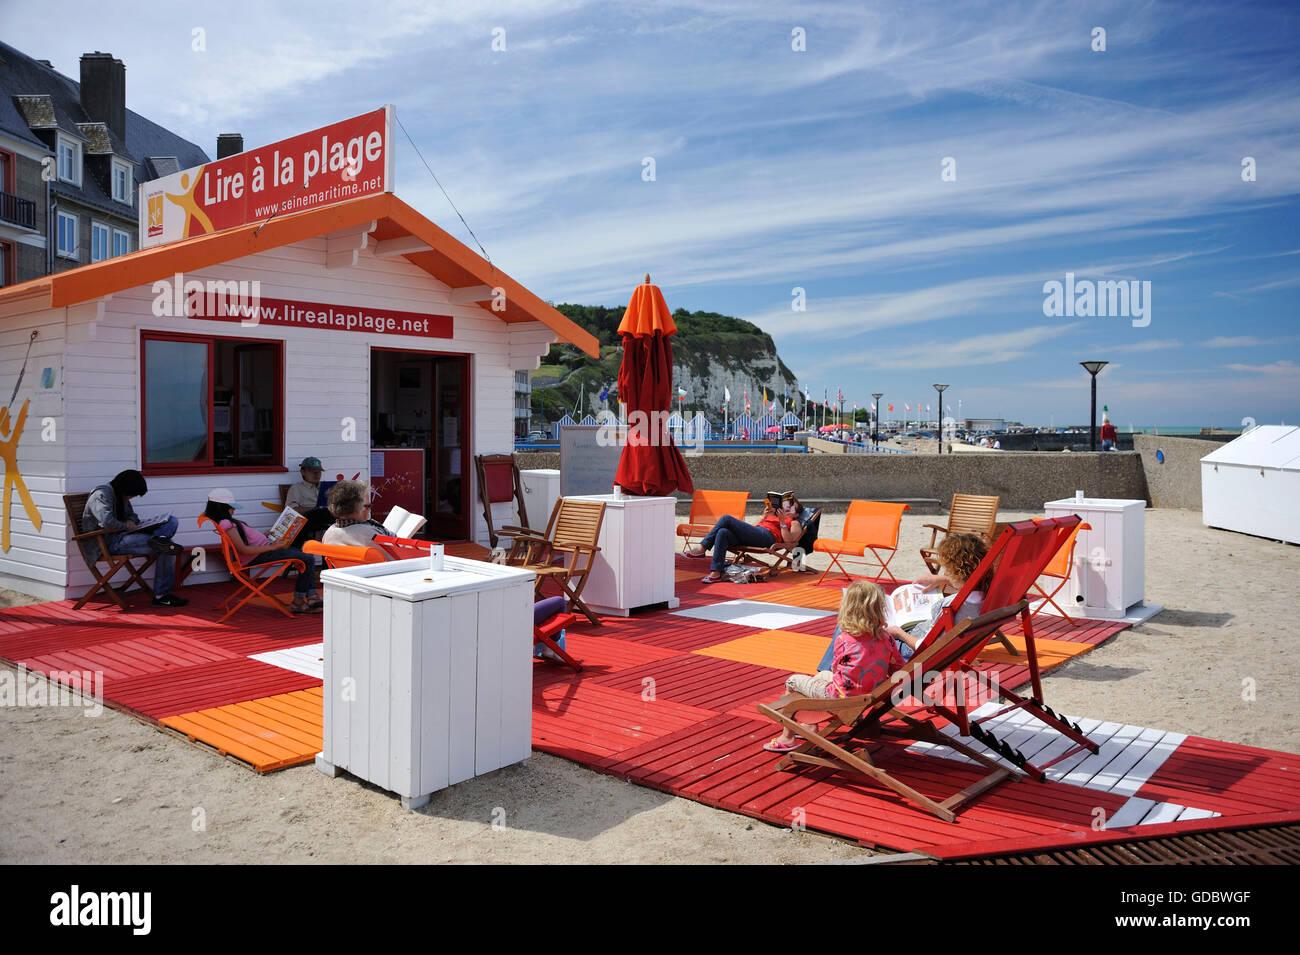 Beach, St-Valery-en-Caux, Normandy, France - Stock Image